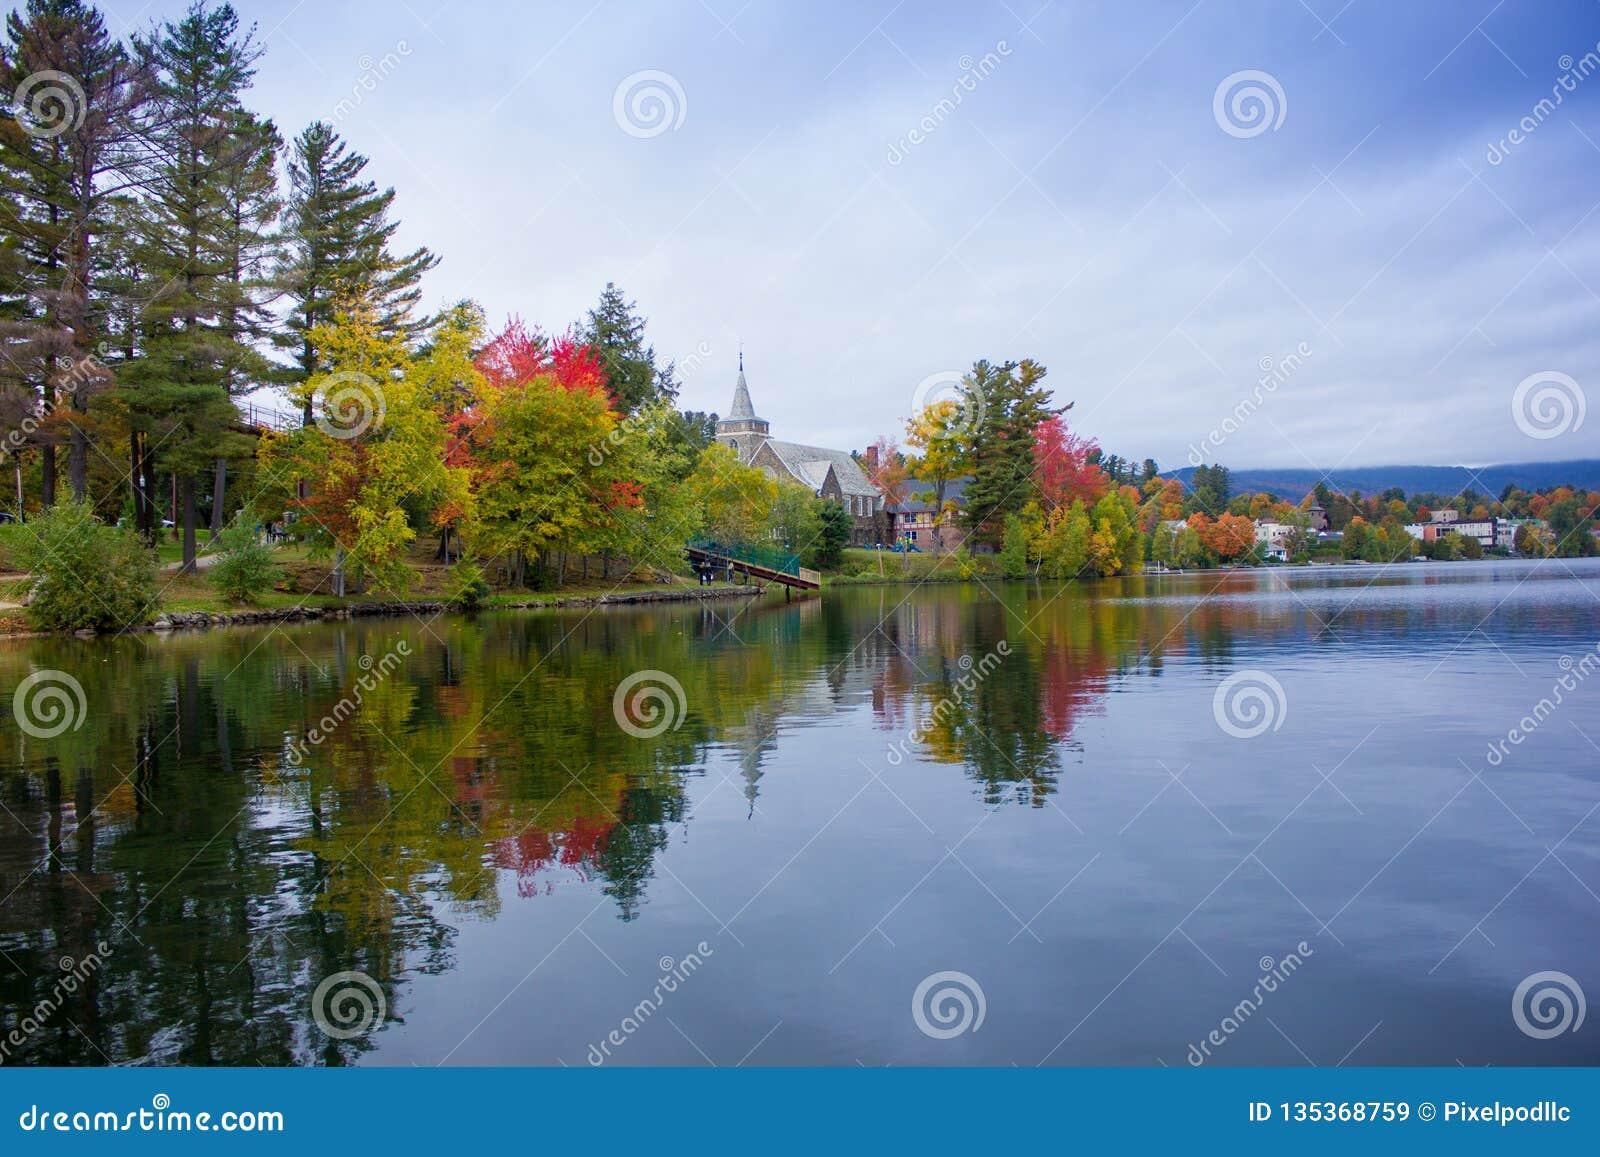 Fall colors in North America